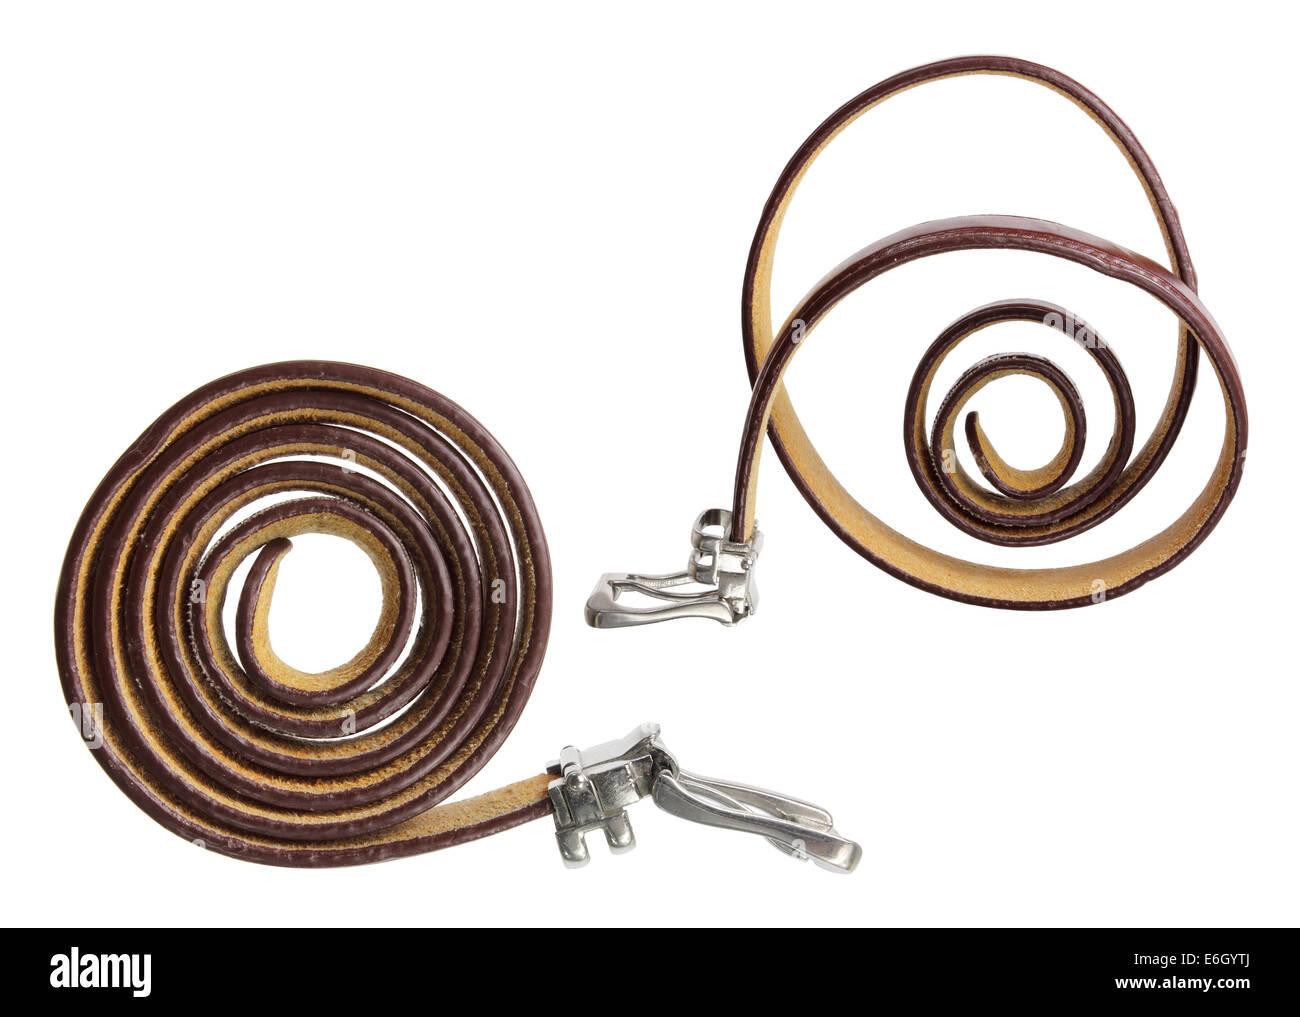 Lady's Belts - Stock Image